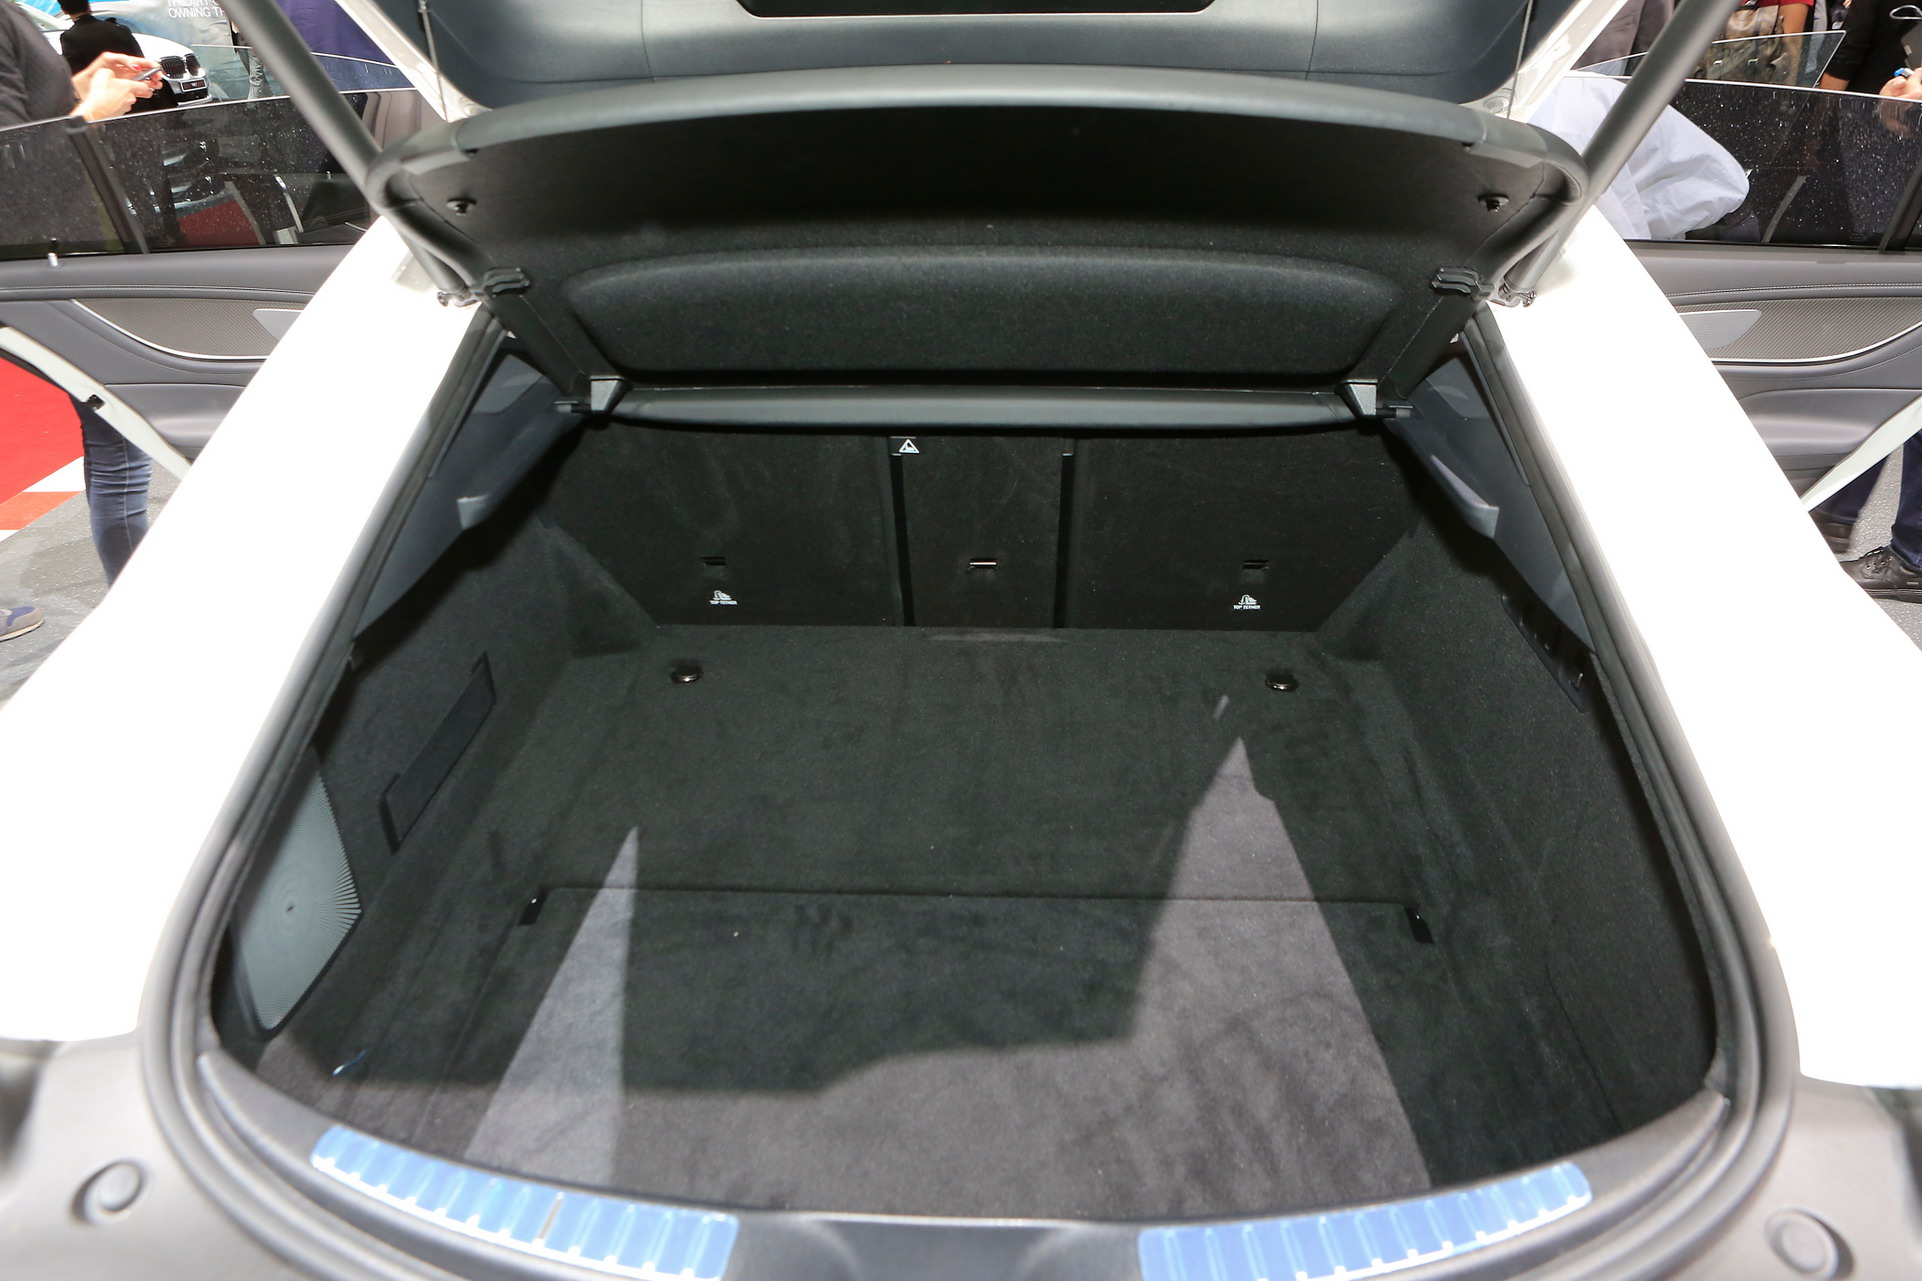 mercedes amg gt 4 kap l coup cenevre 39 de tan t ld otoyazar. Black Bedroom Furniture Sets. Home Design Ideas